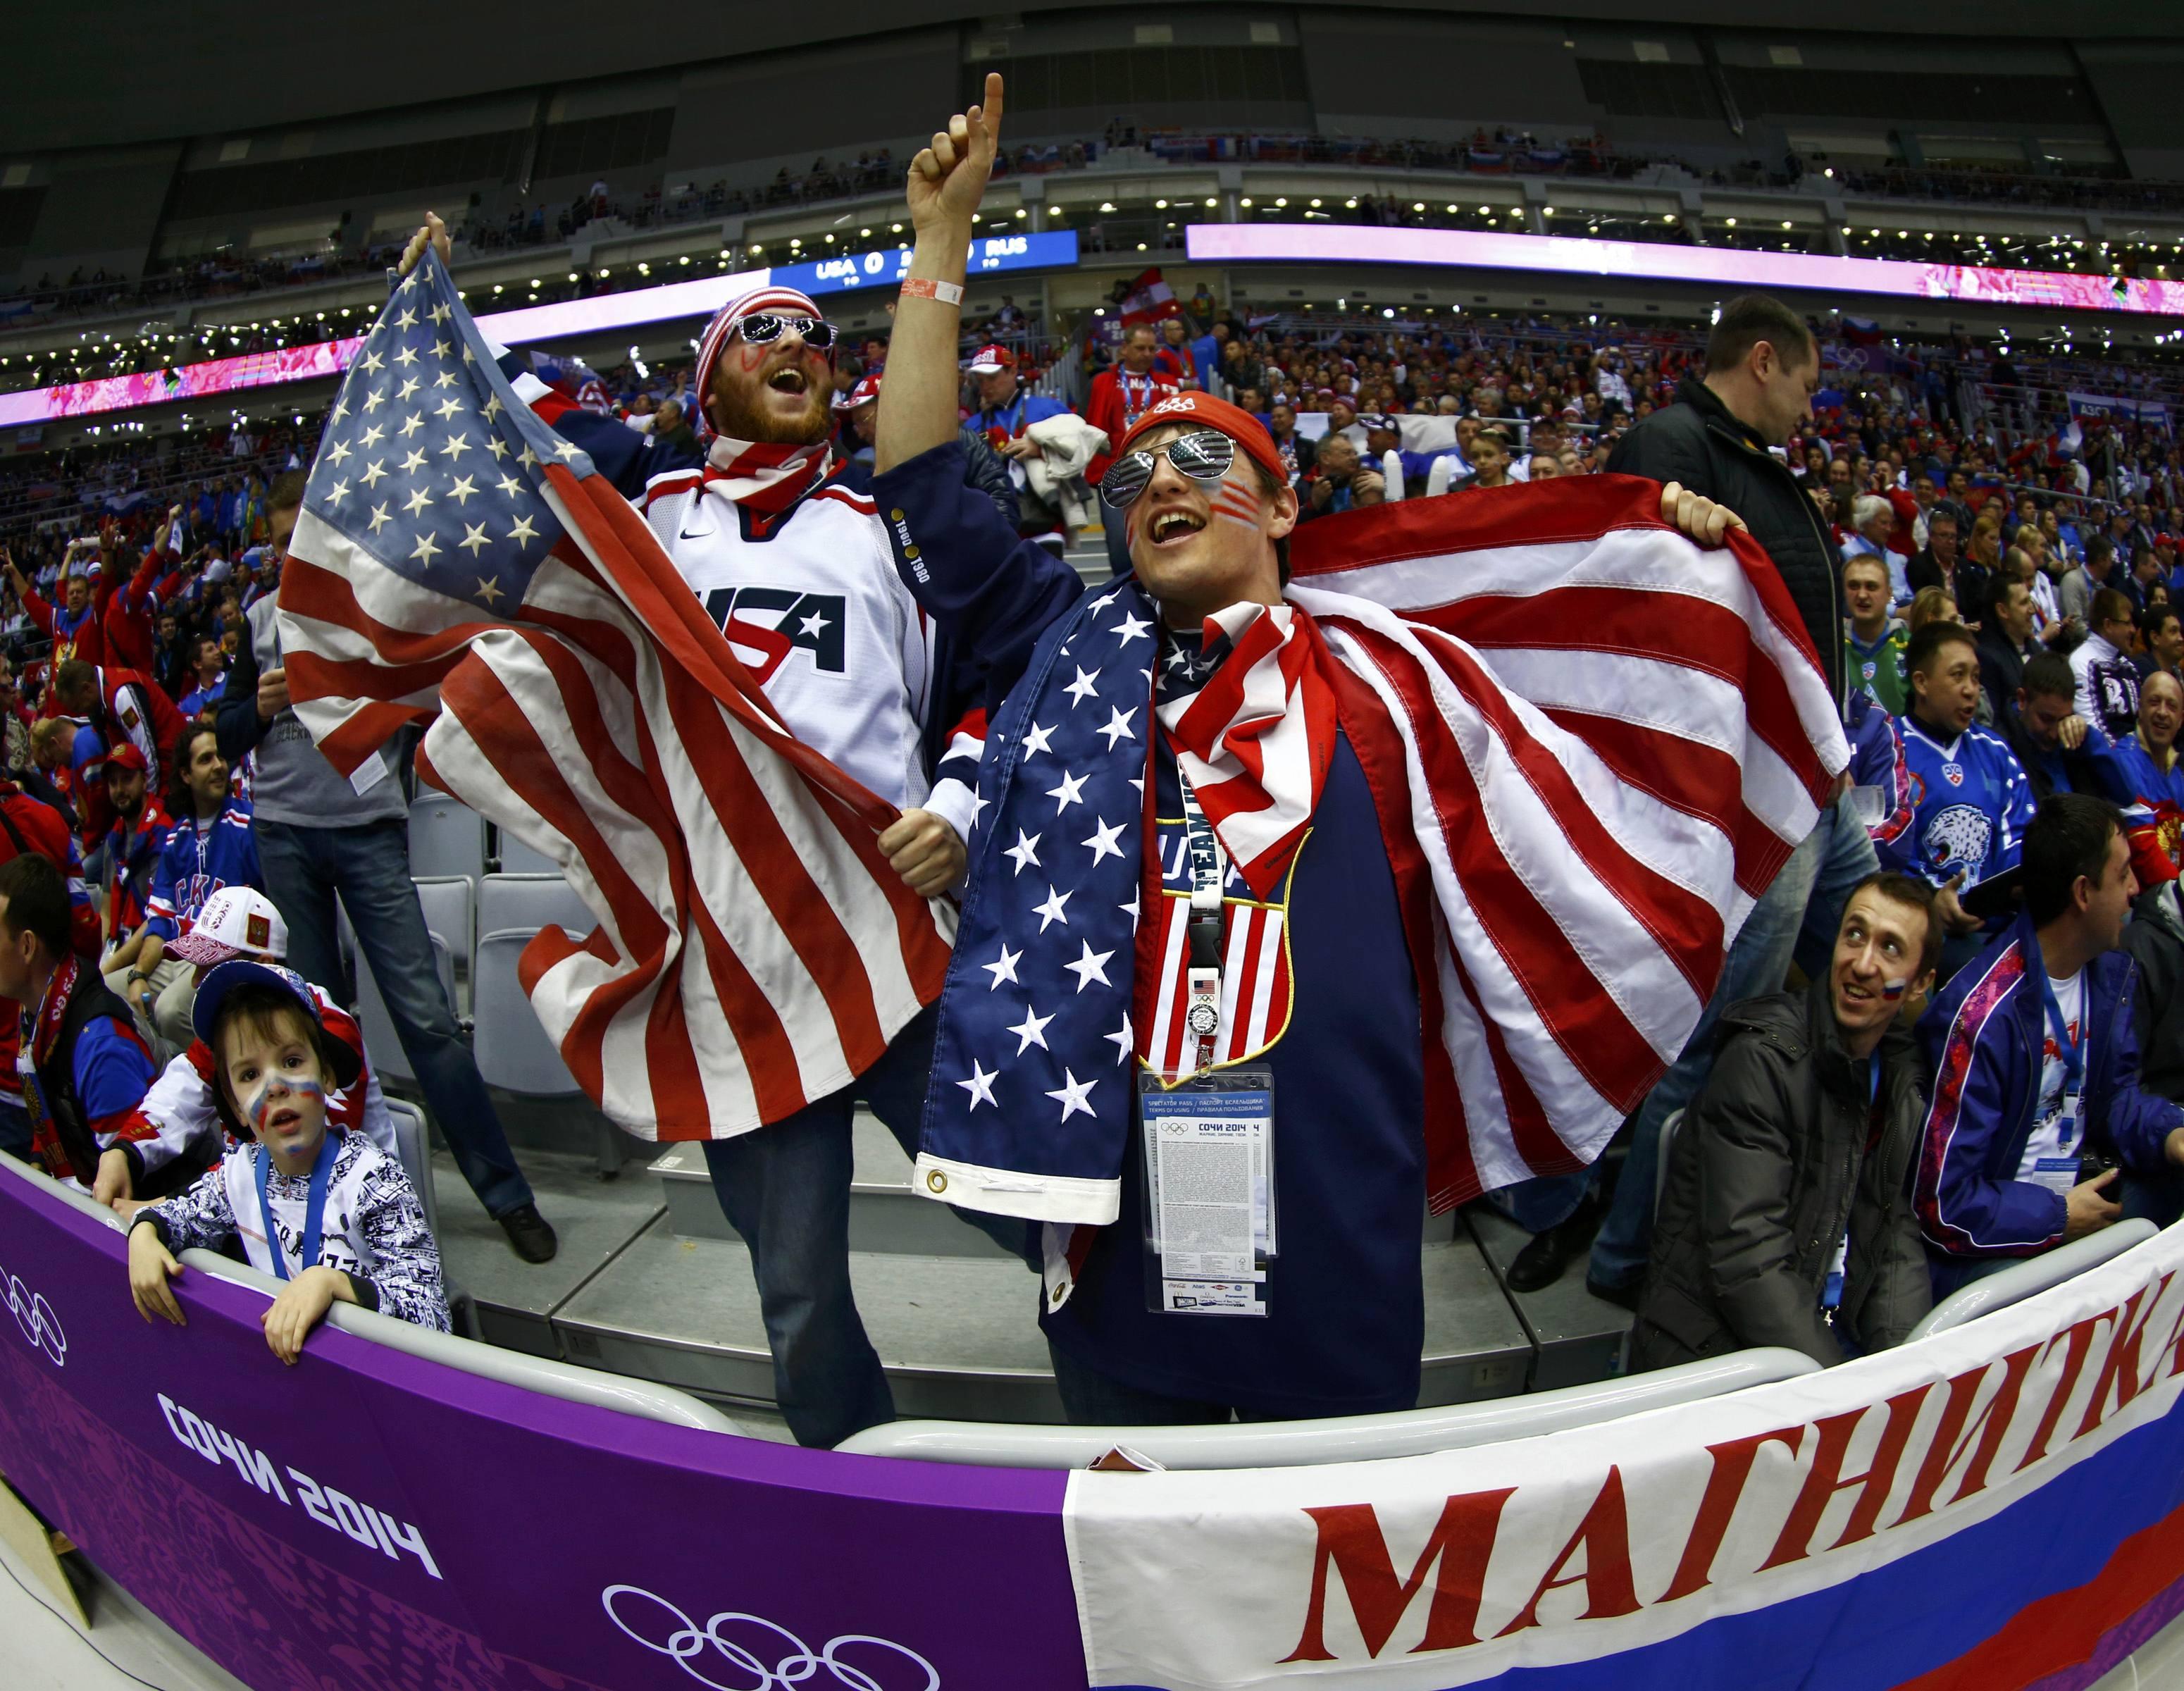 Sochi Olympics Day 10 Tj Oshie Leads Us To Hockey Shootout Win Matt Antoine Wins Us First